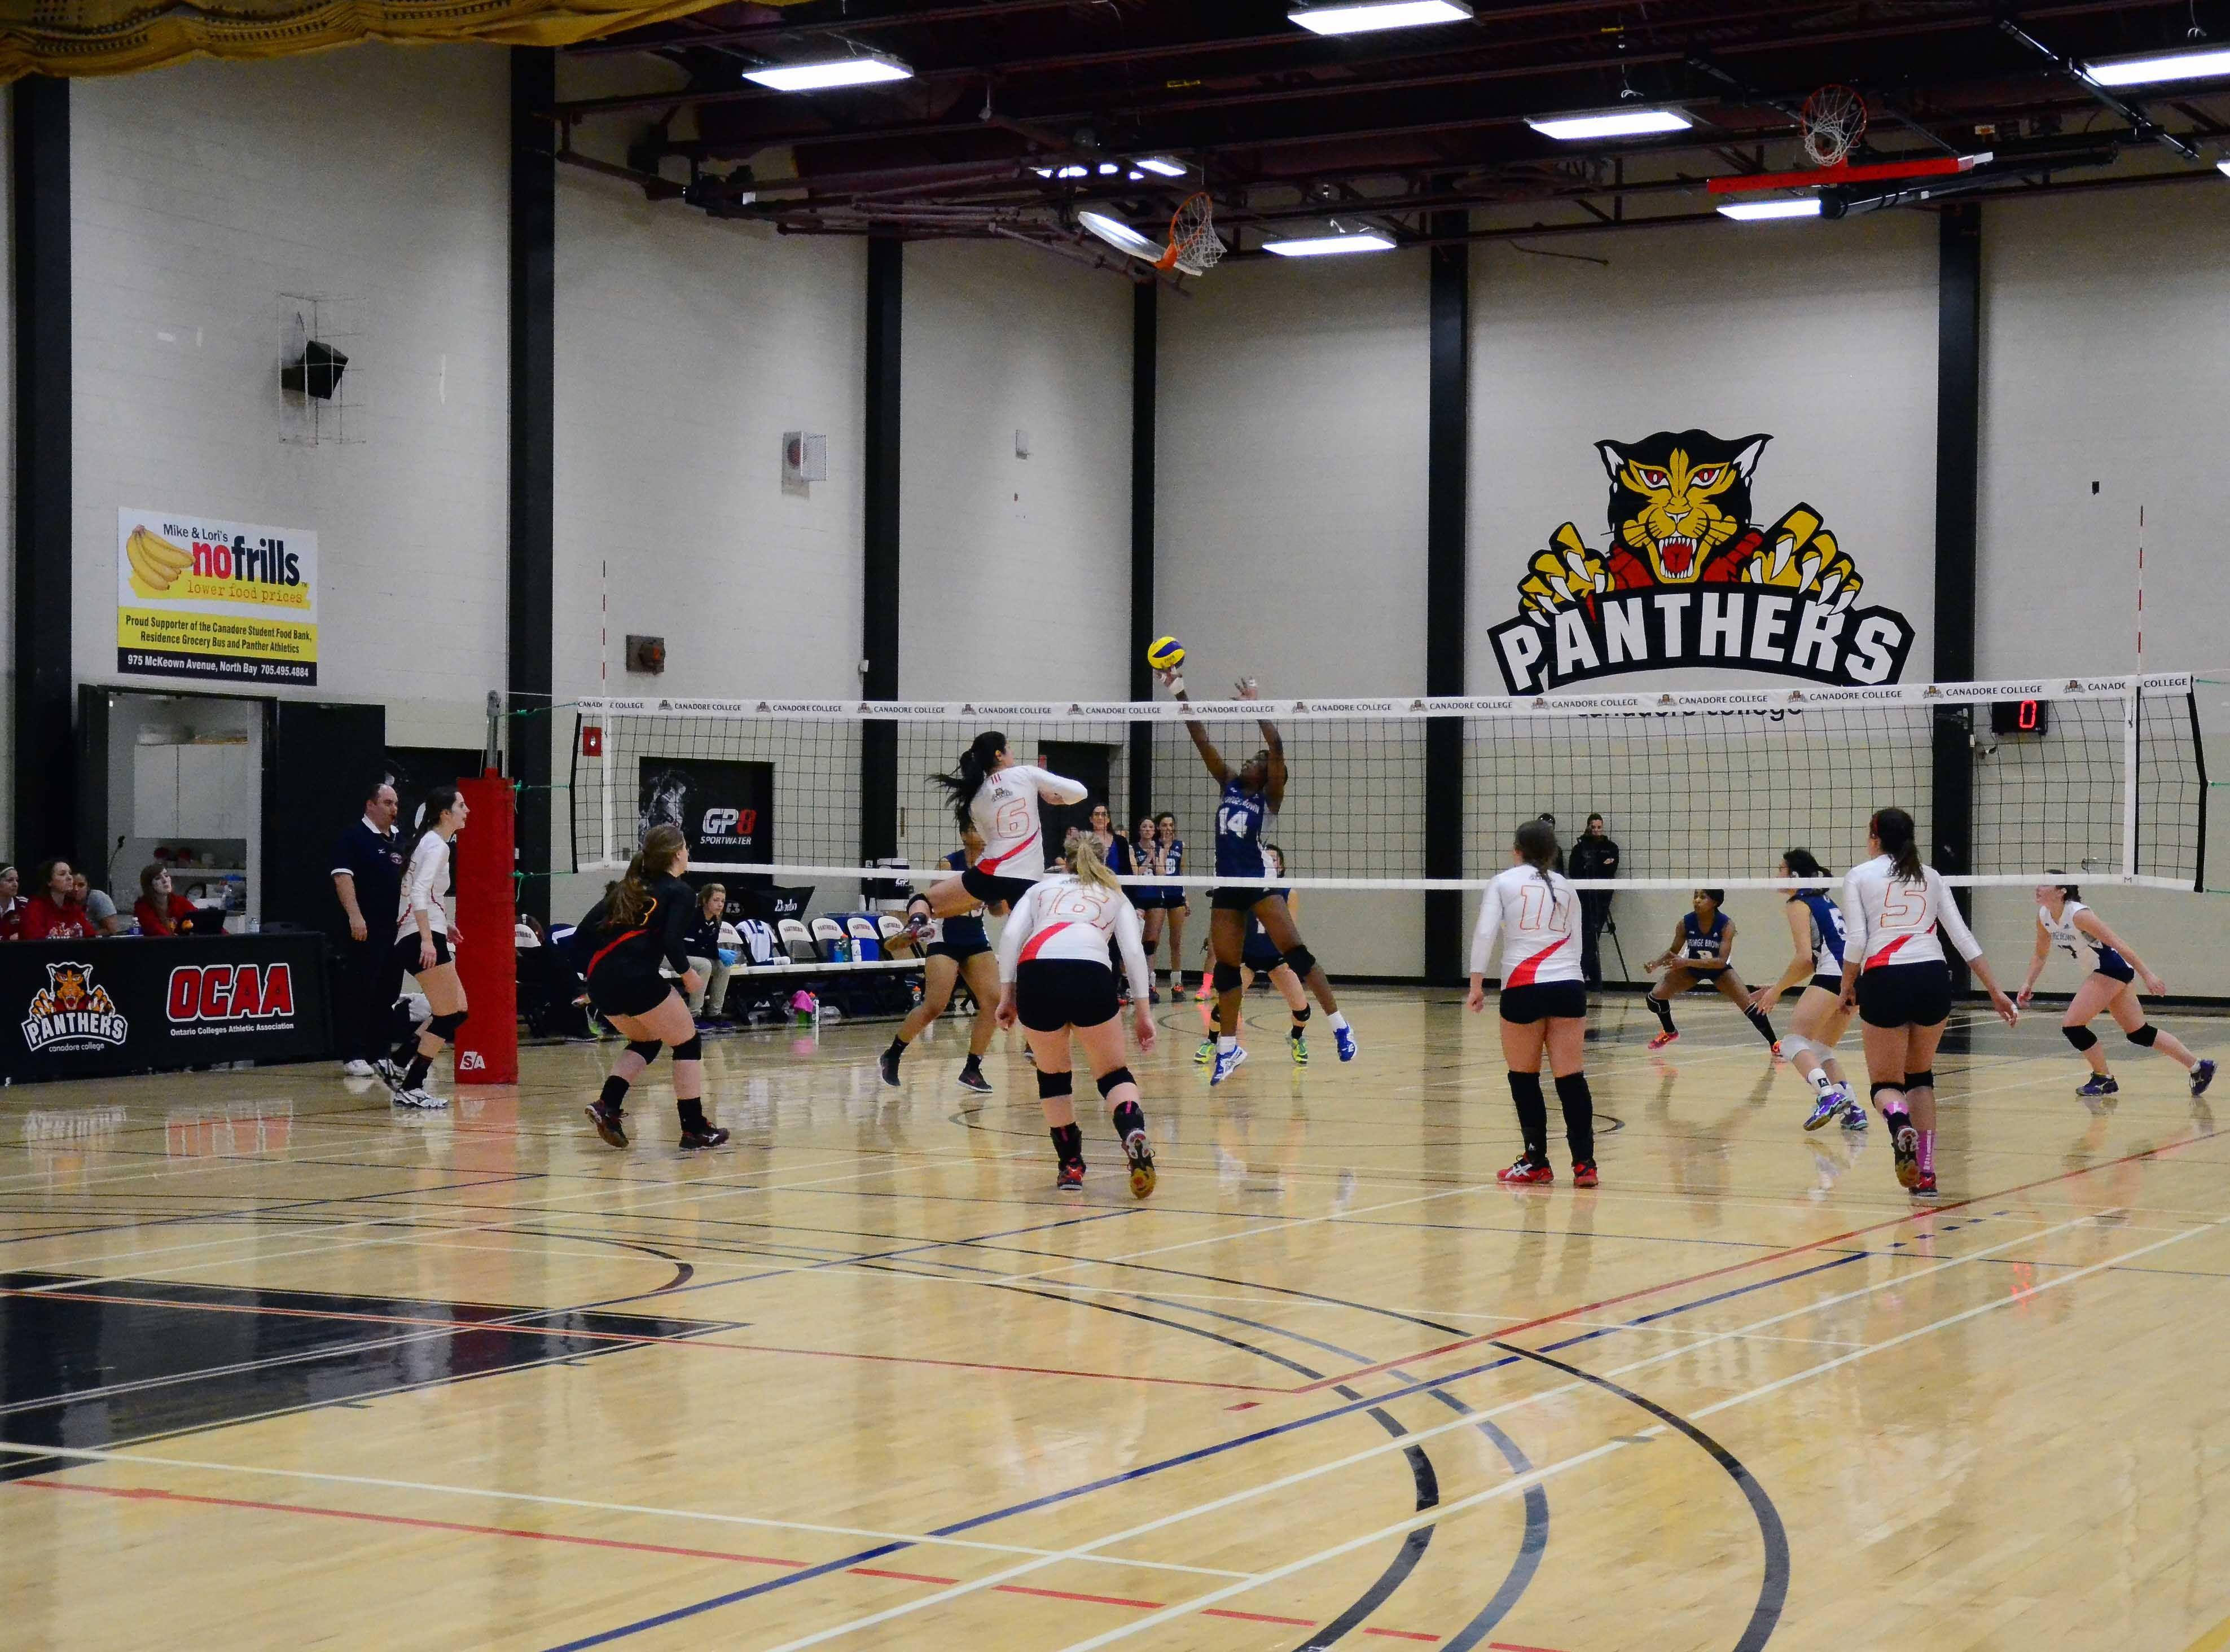 Women S Varsity Volleyball Http Www Canadorecollege Ca Athletics Women E2 80 99s Volleyball Women Volleyball Volleyball Varsity